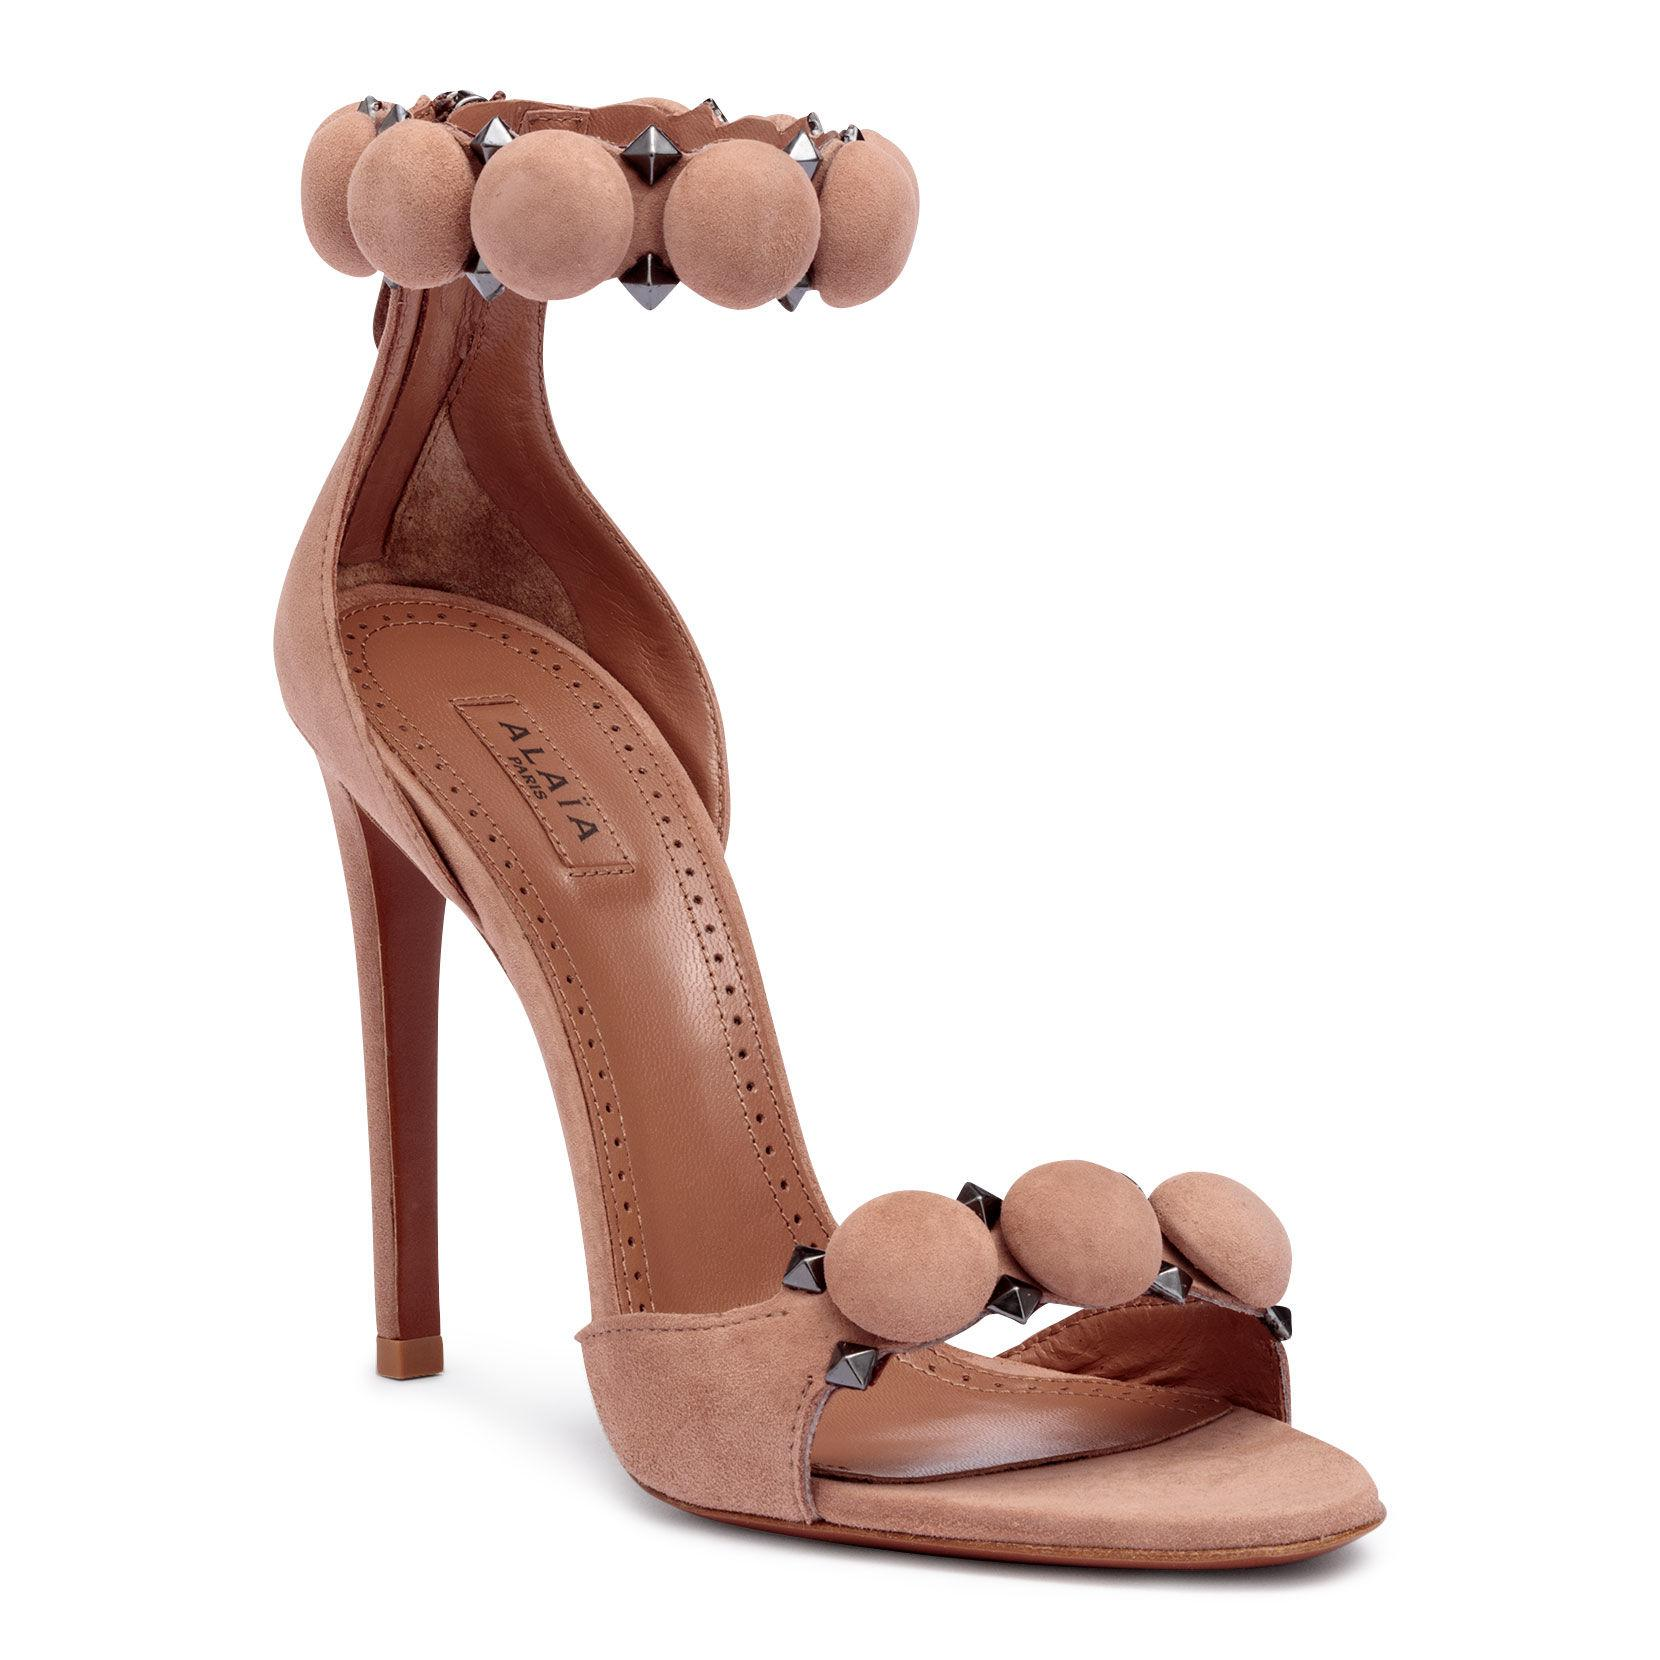 2a480673fc6f Alaïa Beige Suede Bomb Sandals in Natural - Save 27% - Lyst